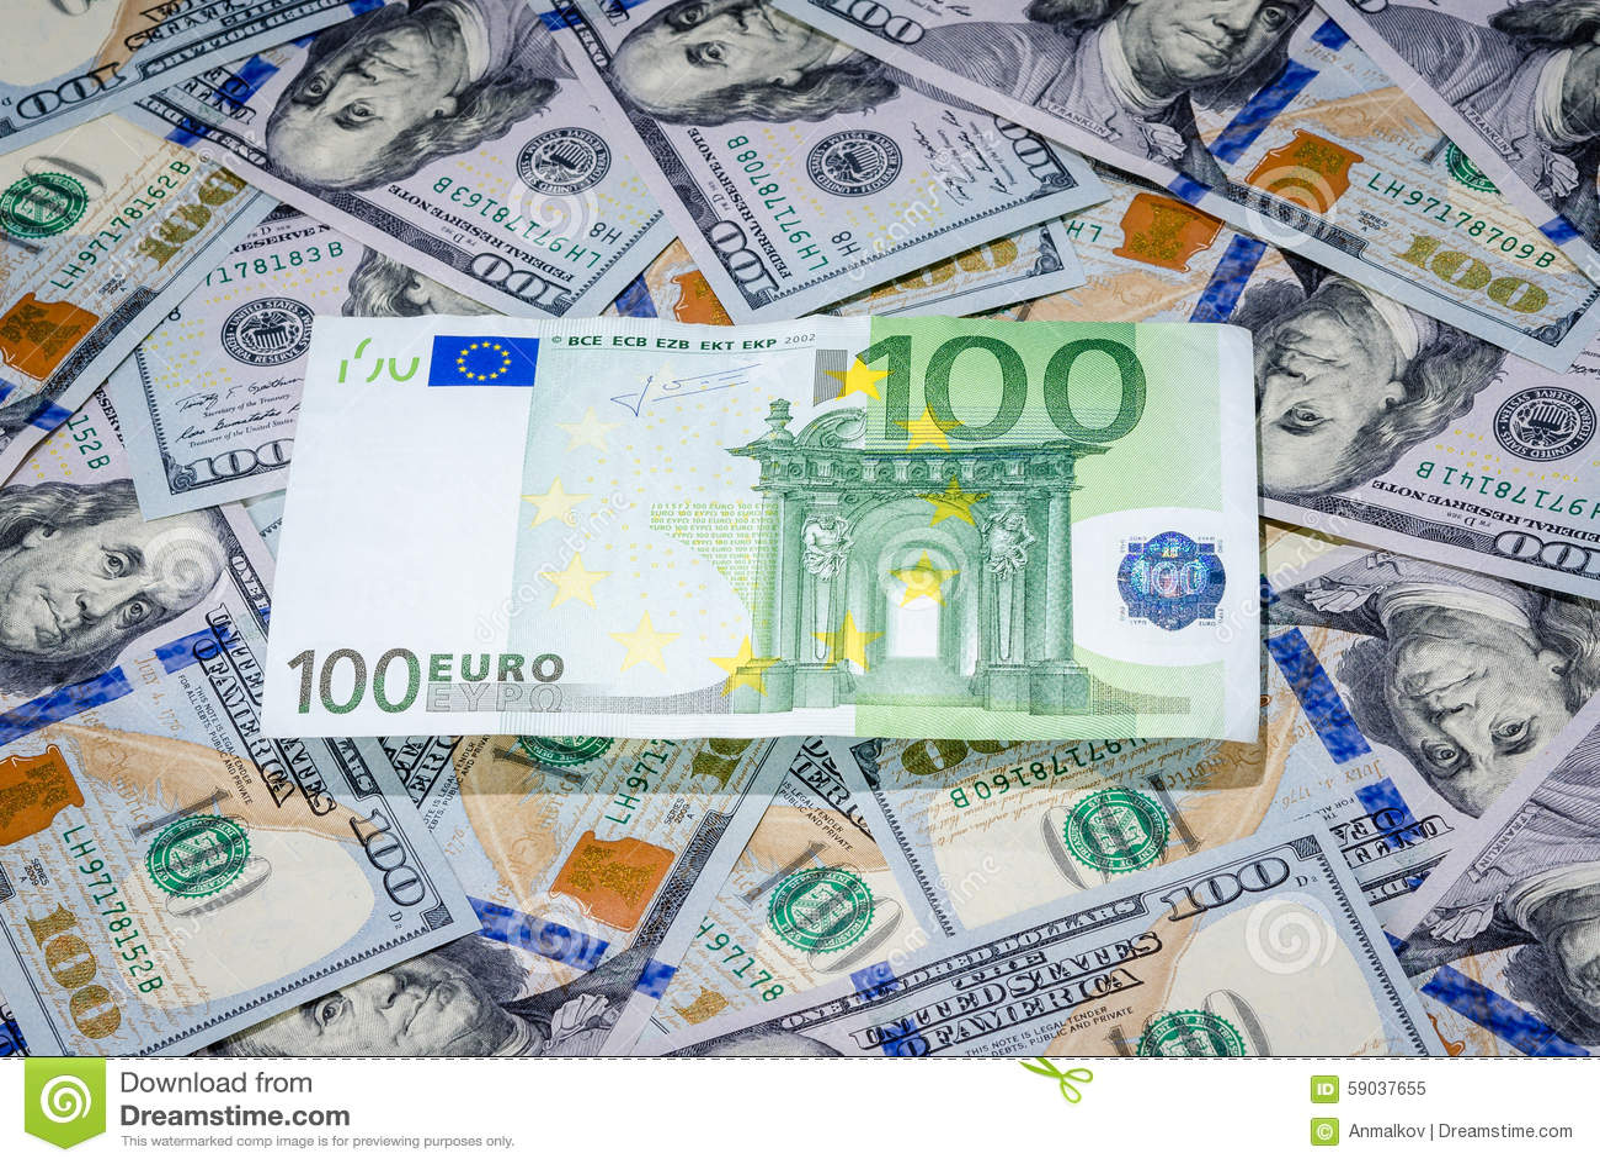 One Hundred Euro On American Dollars Bills Paper Money Background